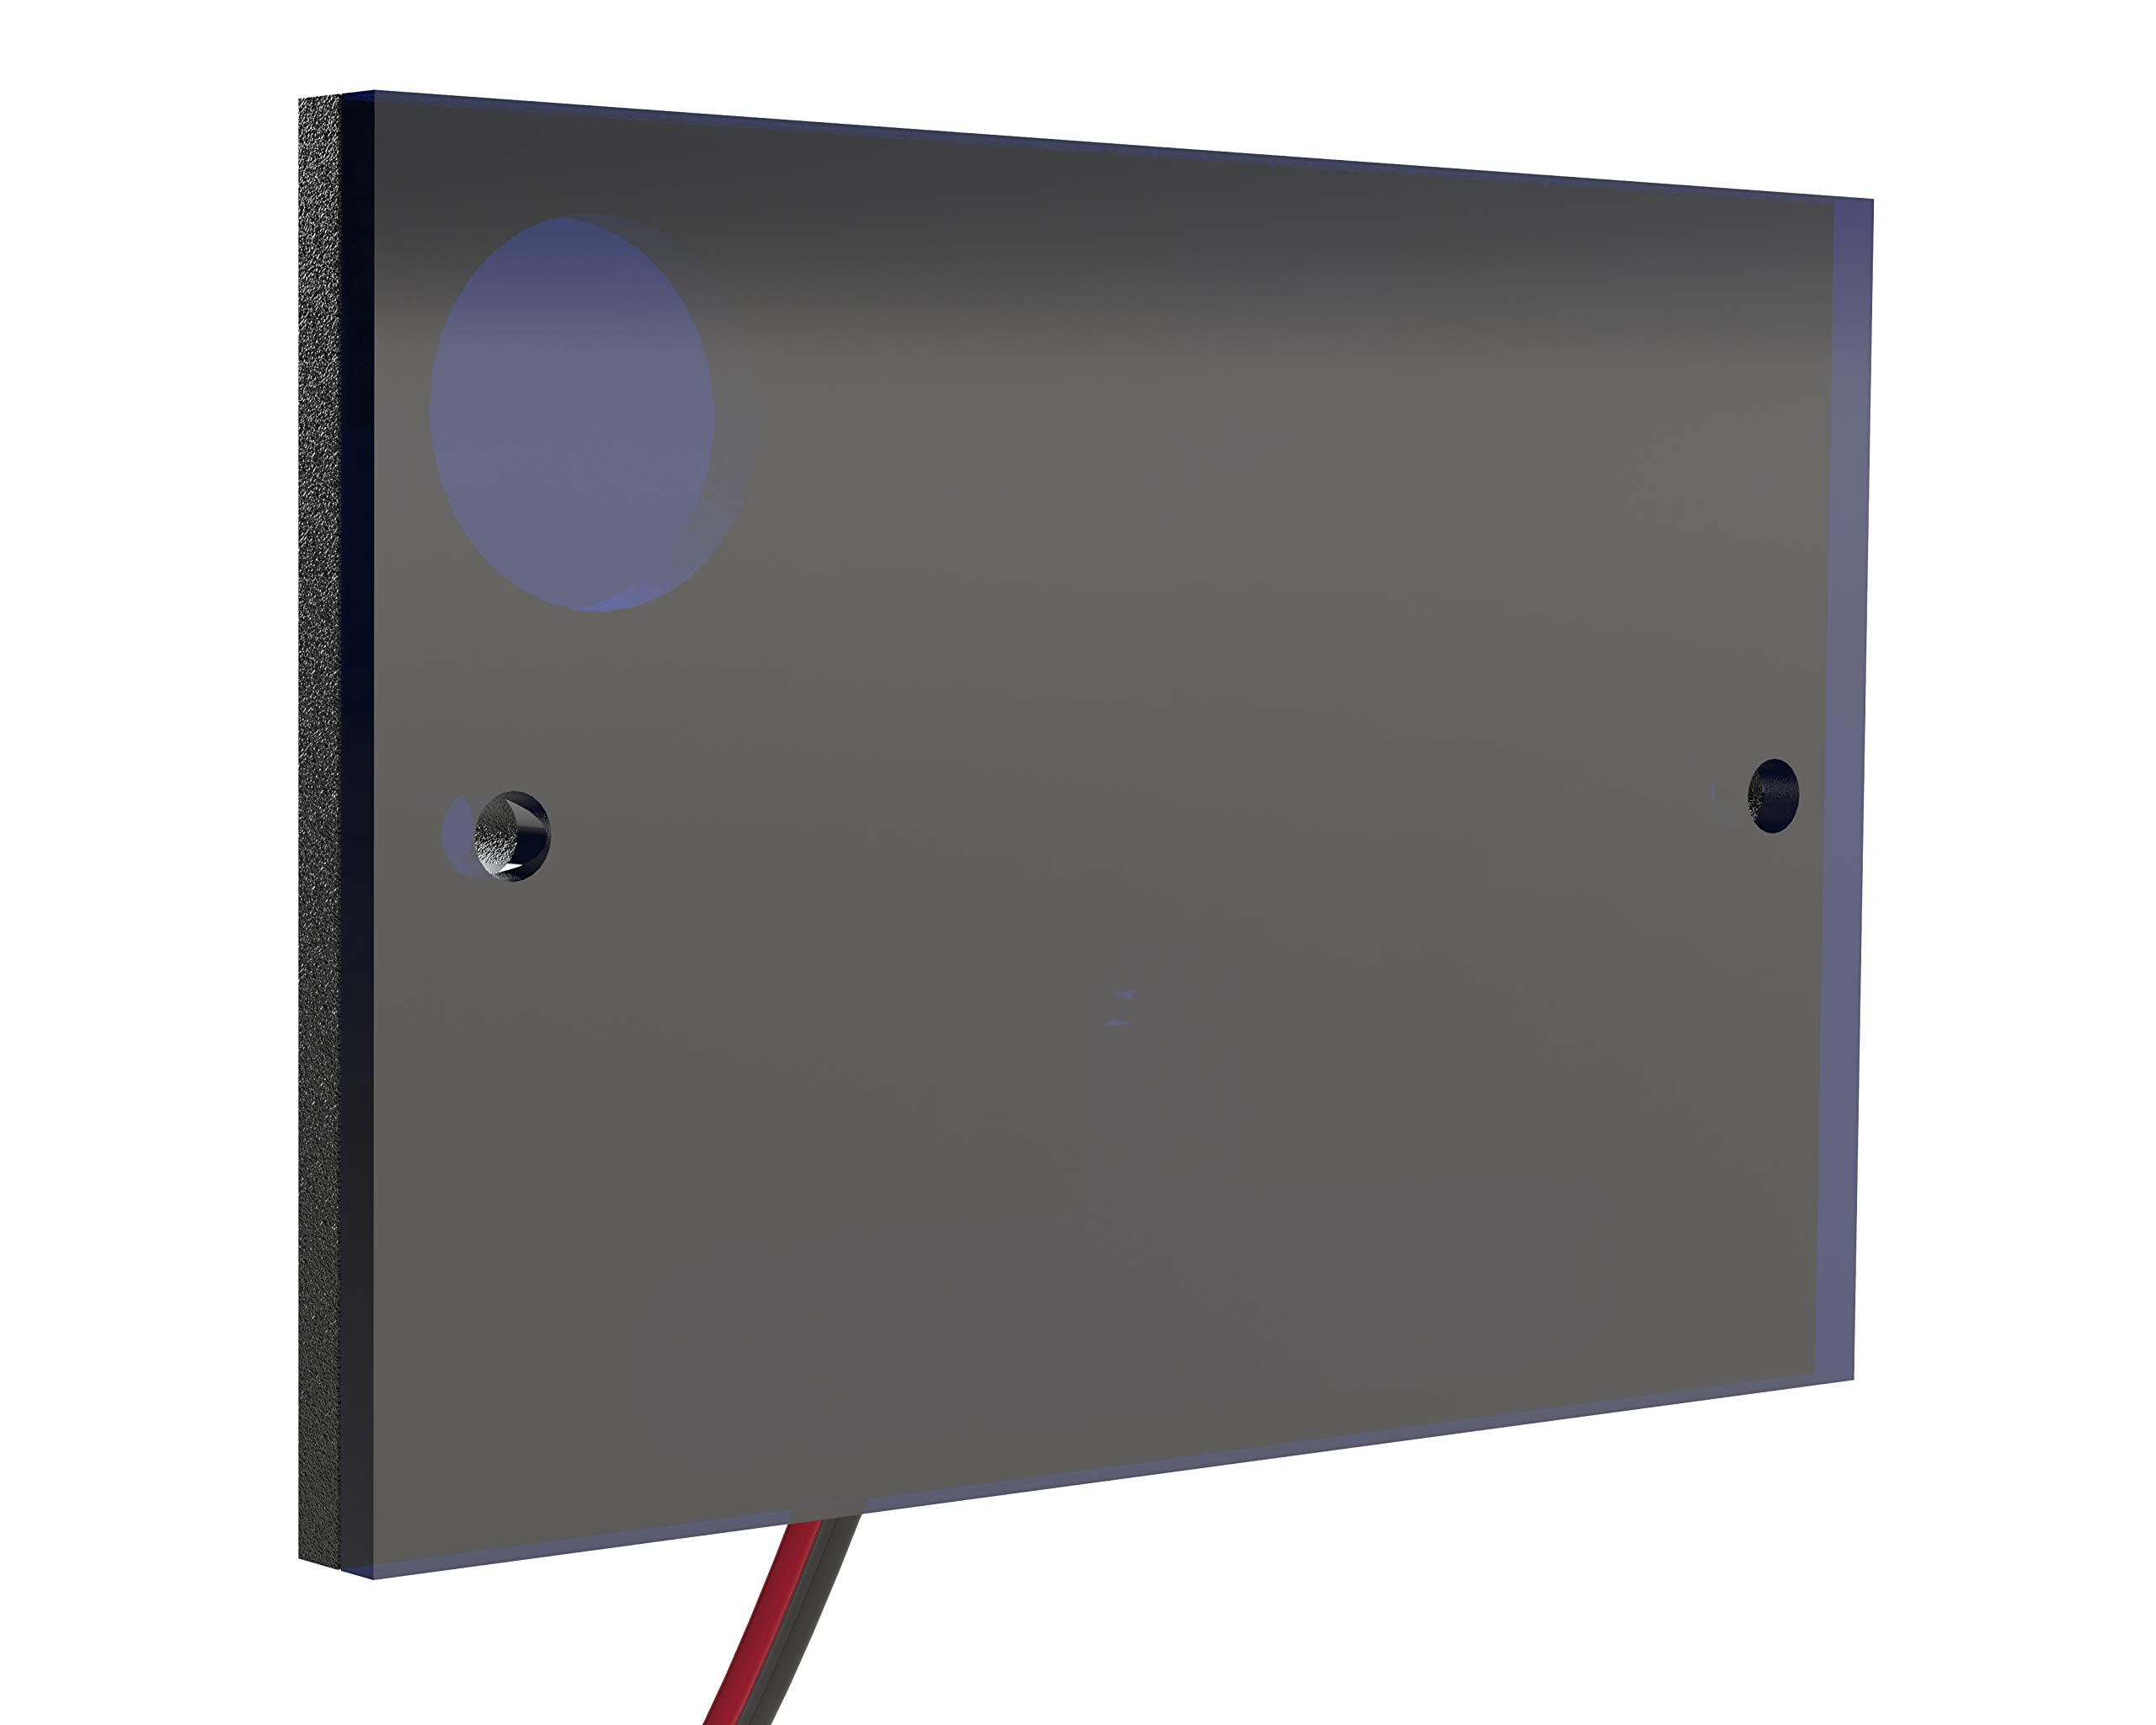 Infrared Illuminator Helios IR-Plate by Microlight